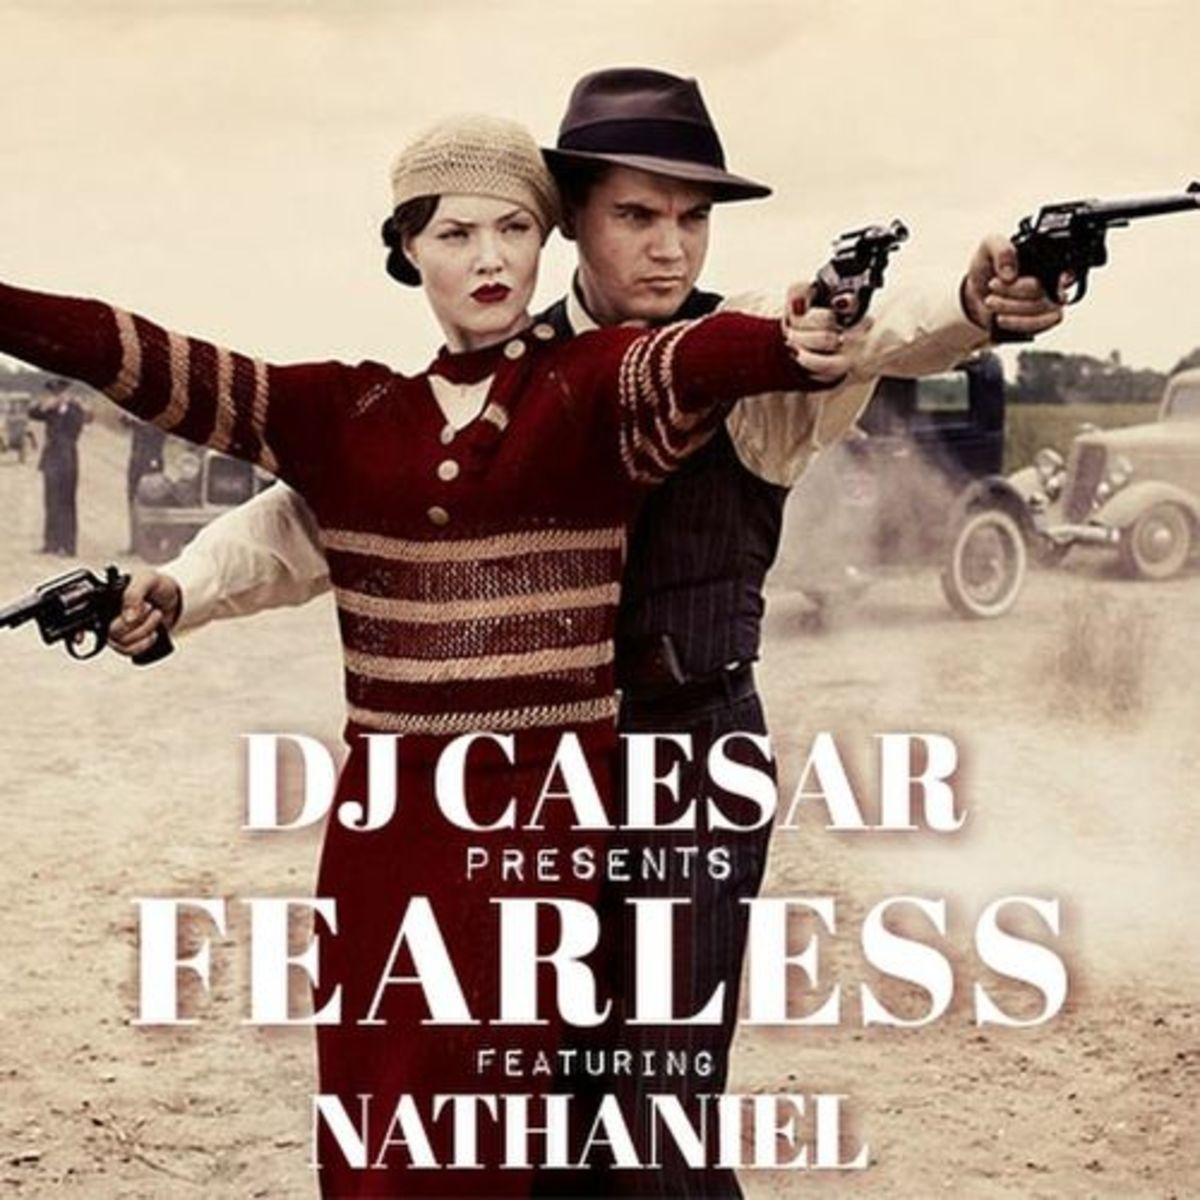 dj-caesar-fearless.jpg